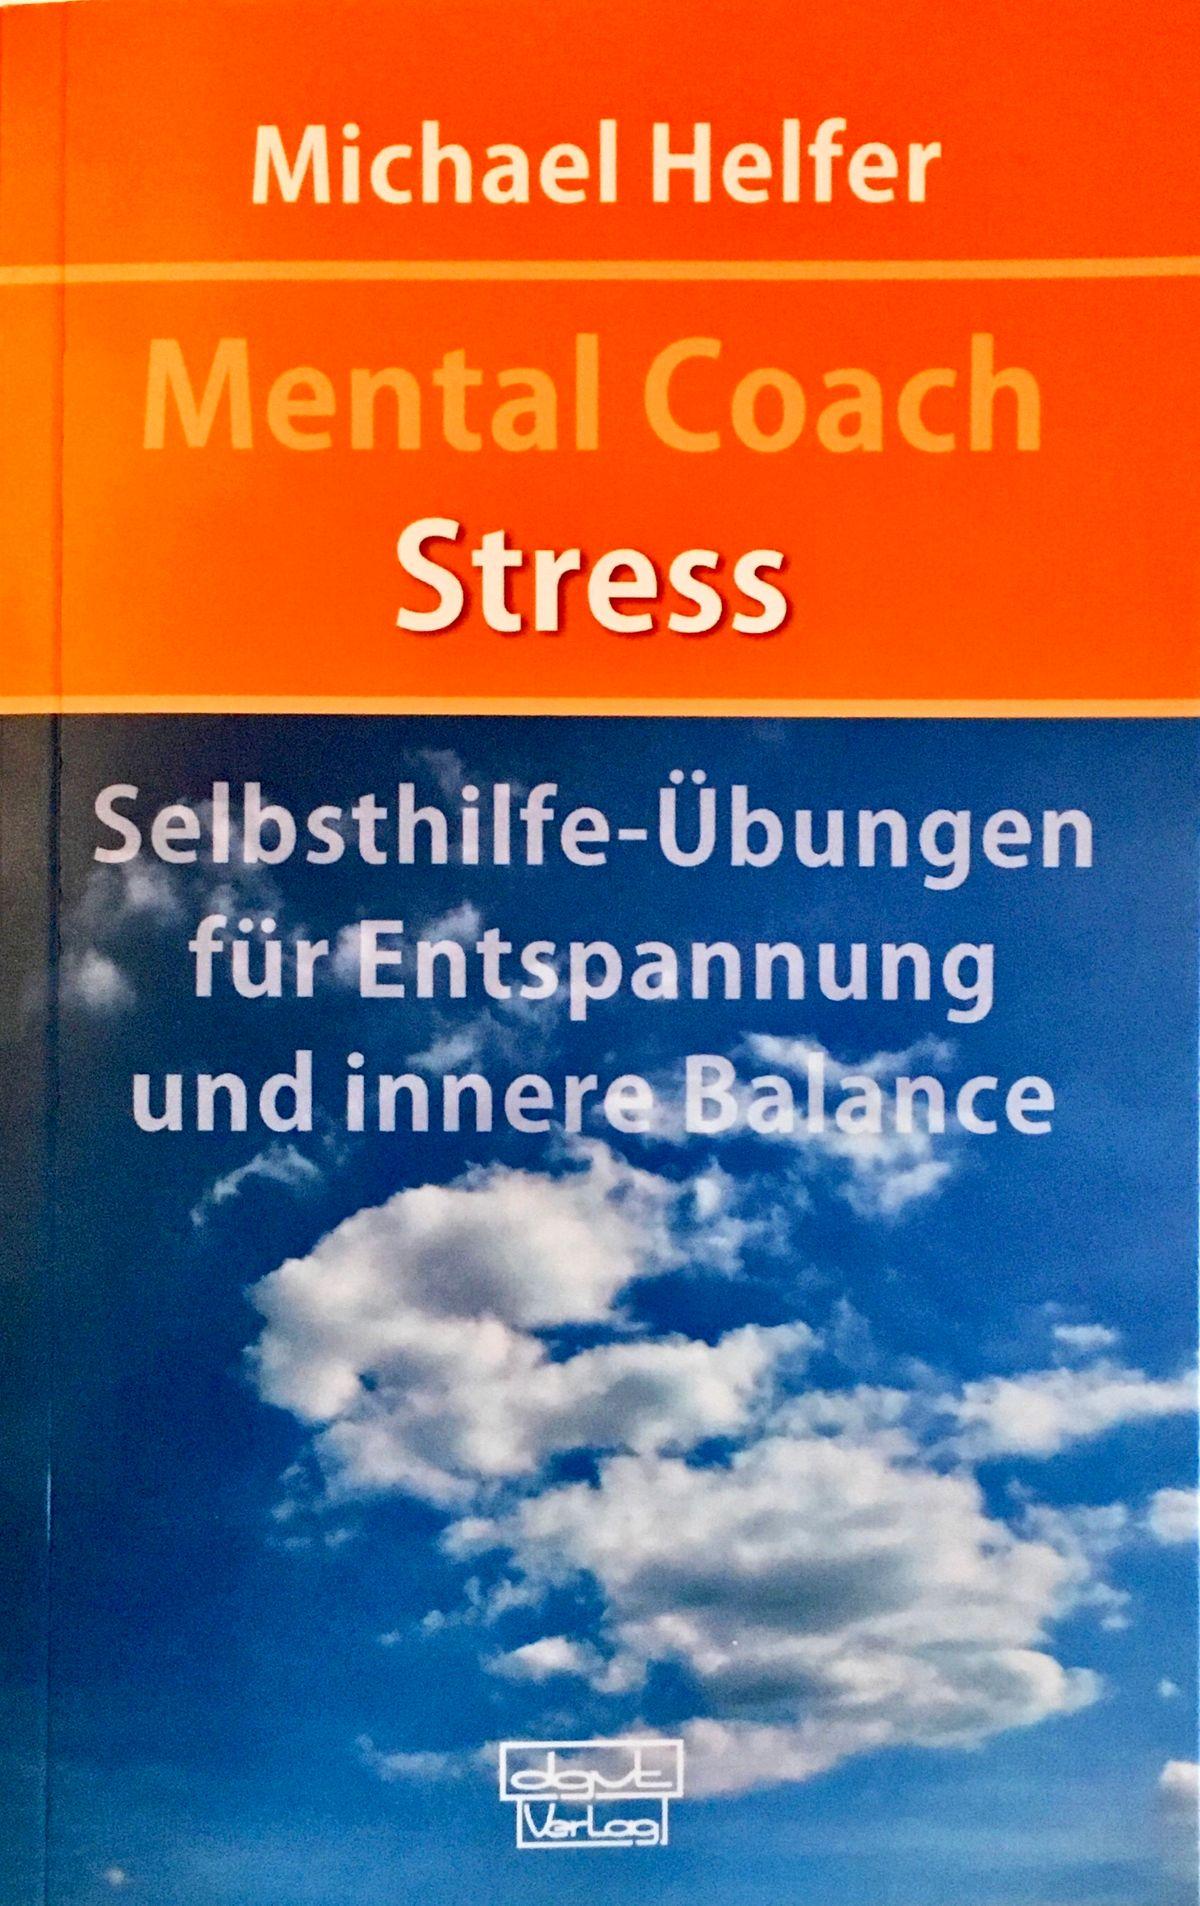 Diplom Psychotherapeut